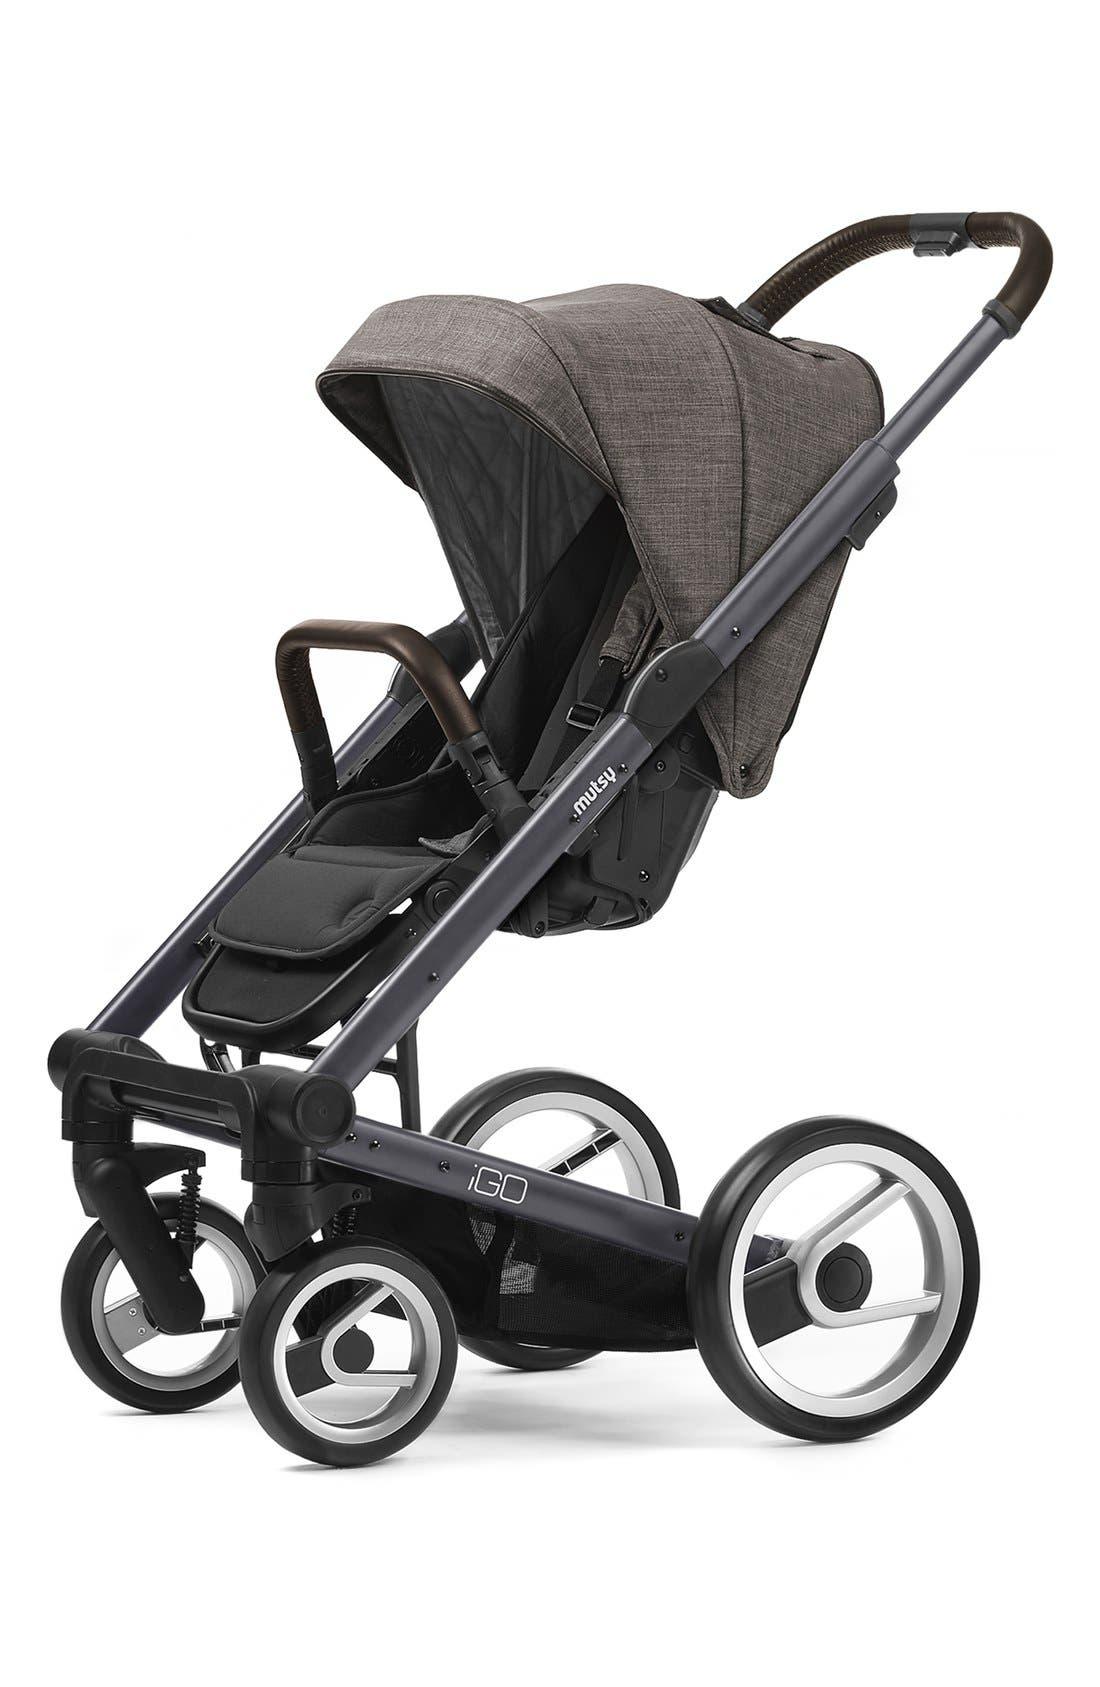 Main Image - Mutsy 'Igo - Farmer Earth' Stroller